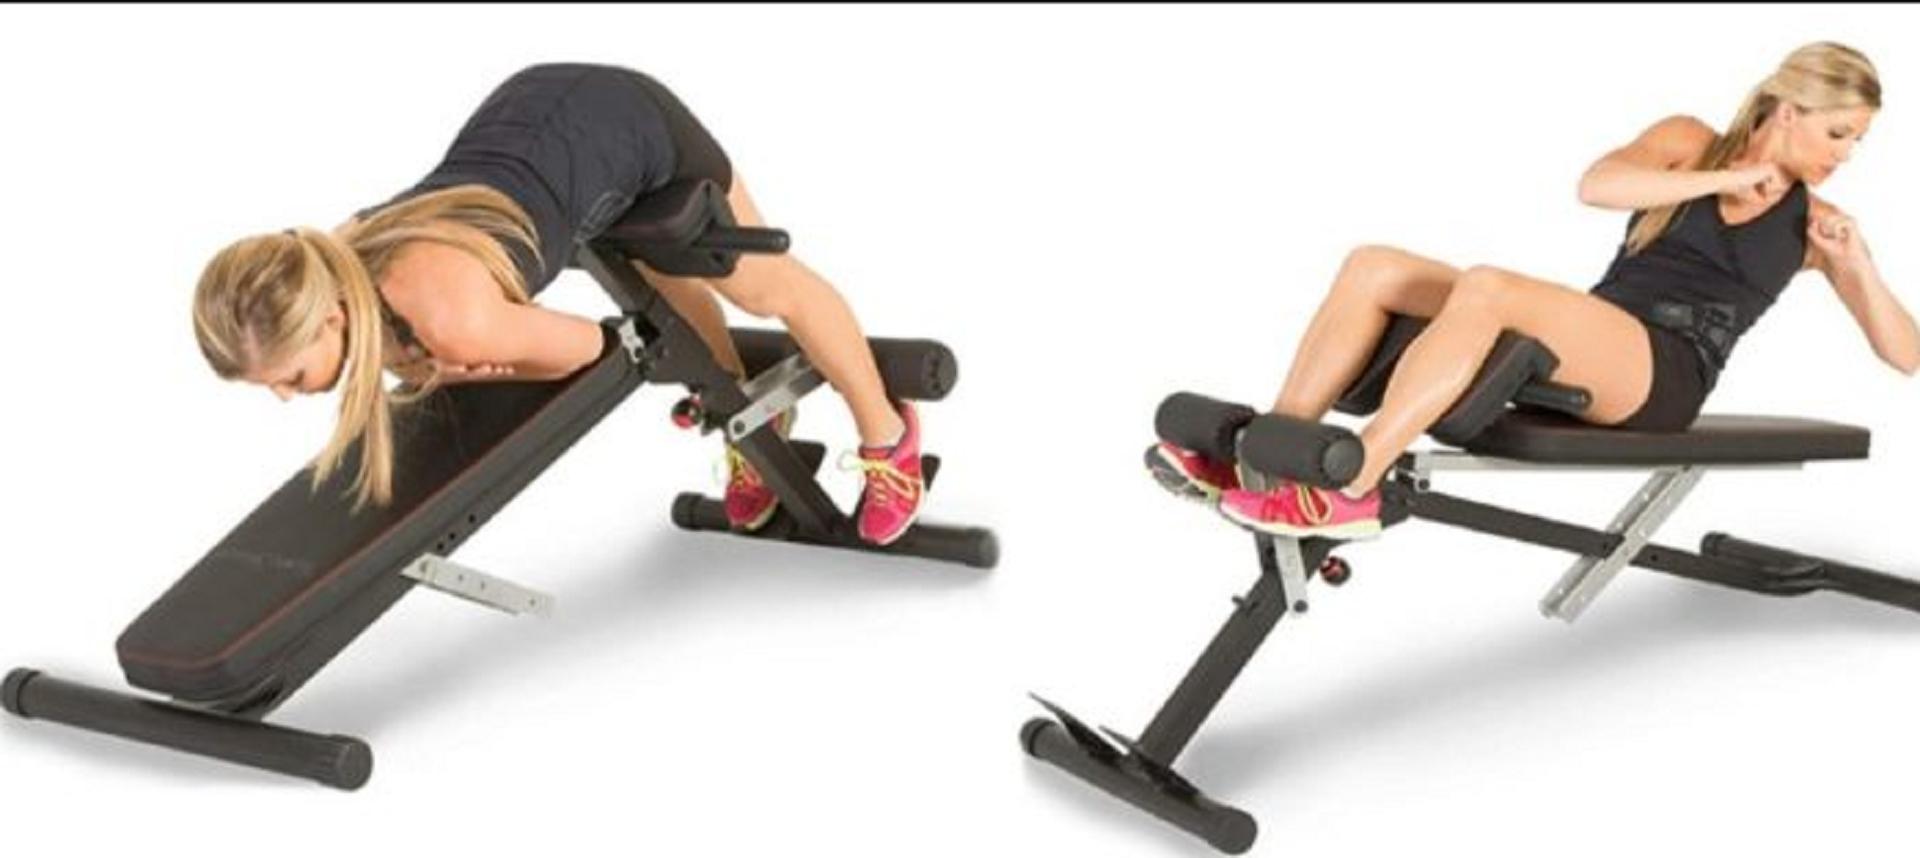 fitness reality x-class abdominal bench